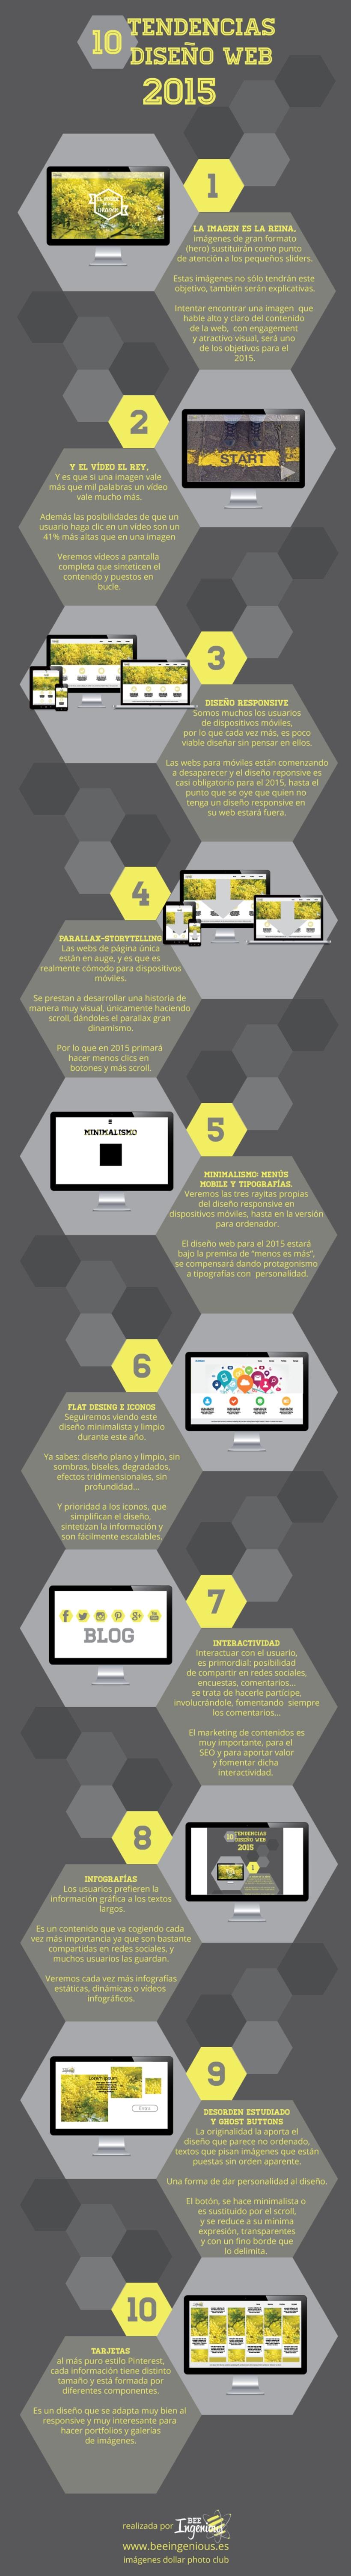 Infografía tendencias de diseño web 2015 -1